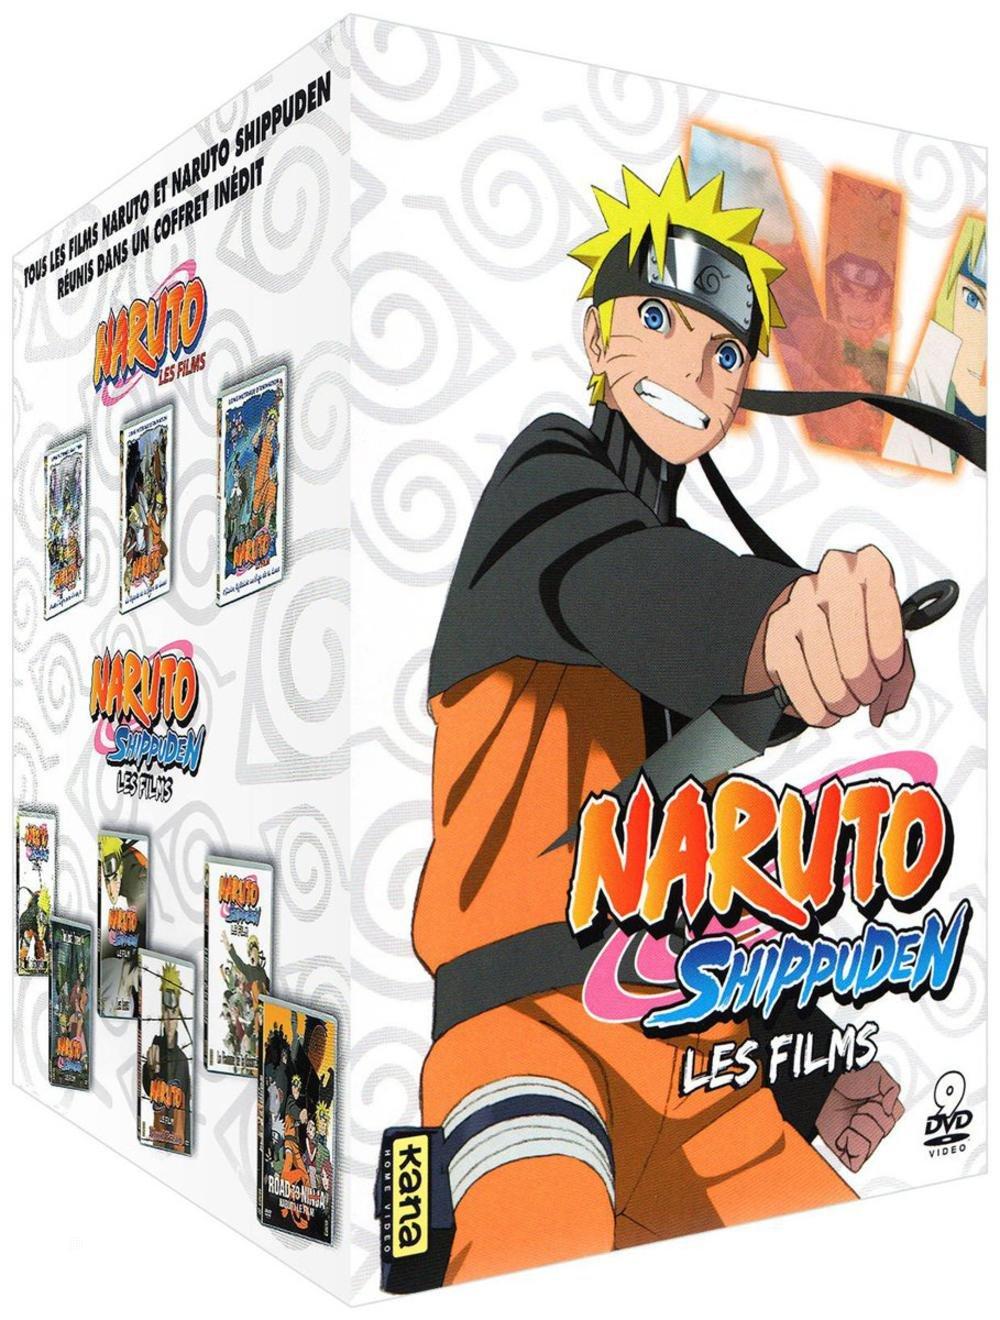 Naruto & Naruto Shippuden - Les 9 films - Coffret DVD ...